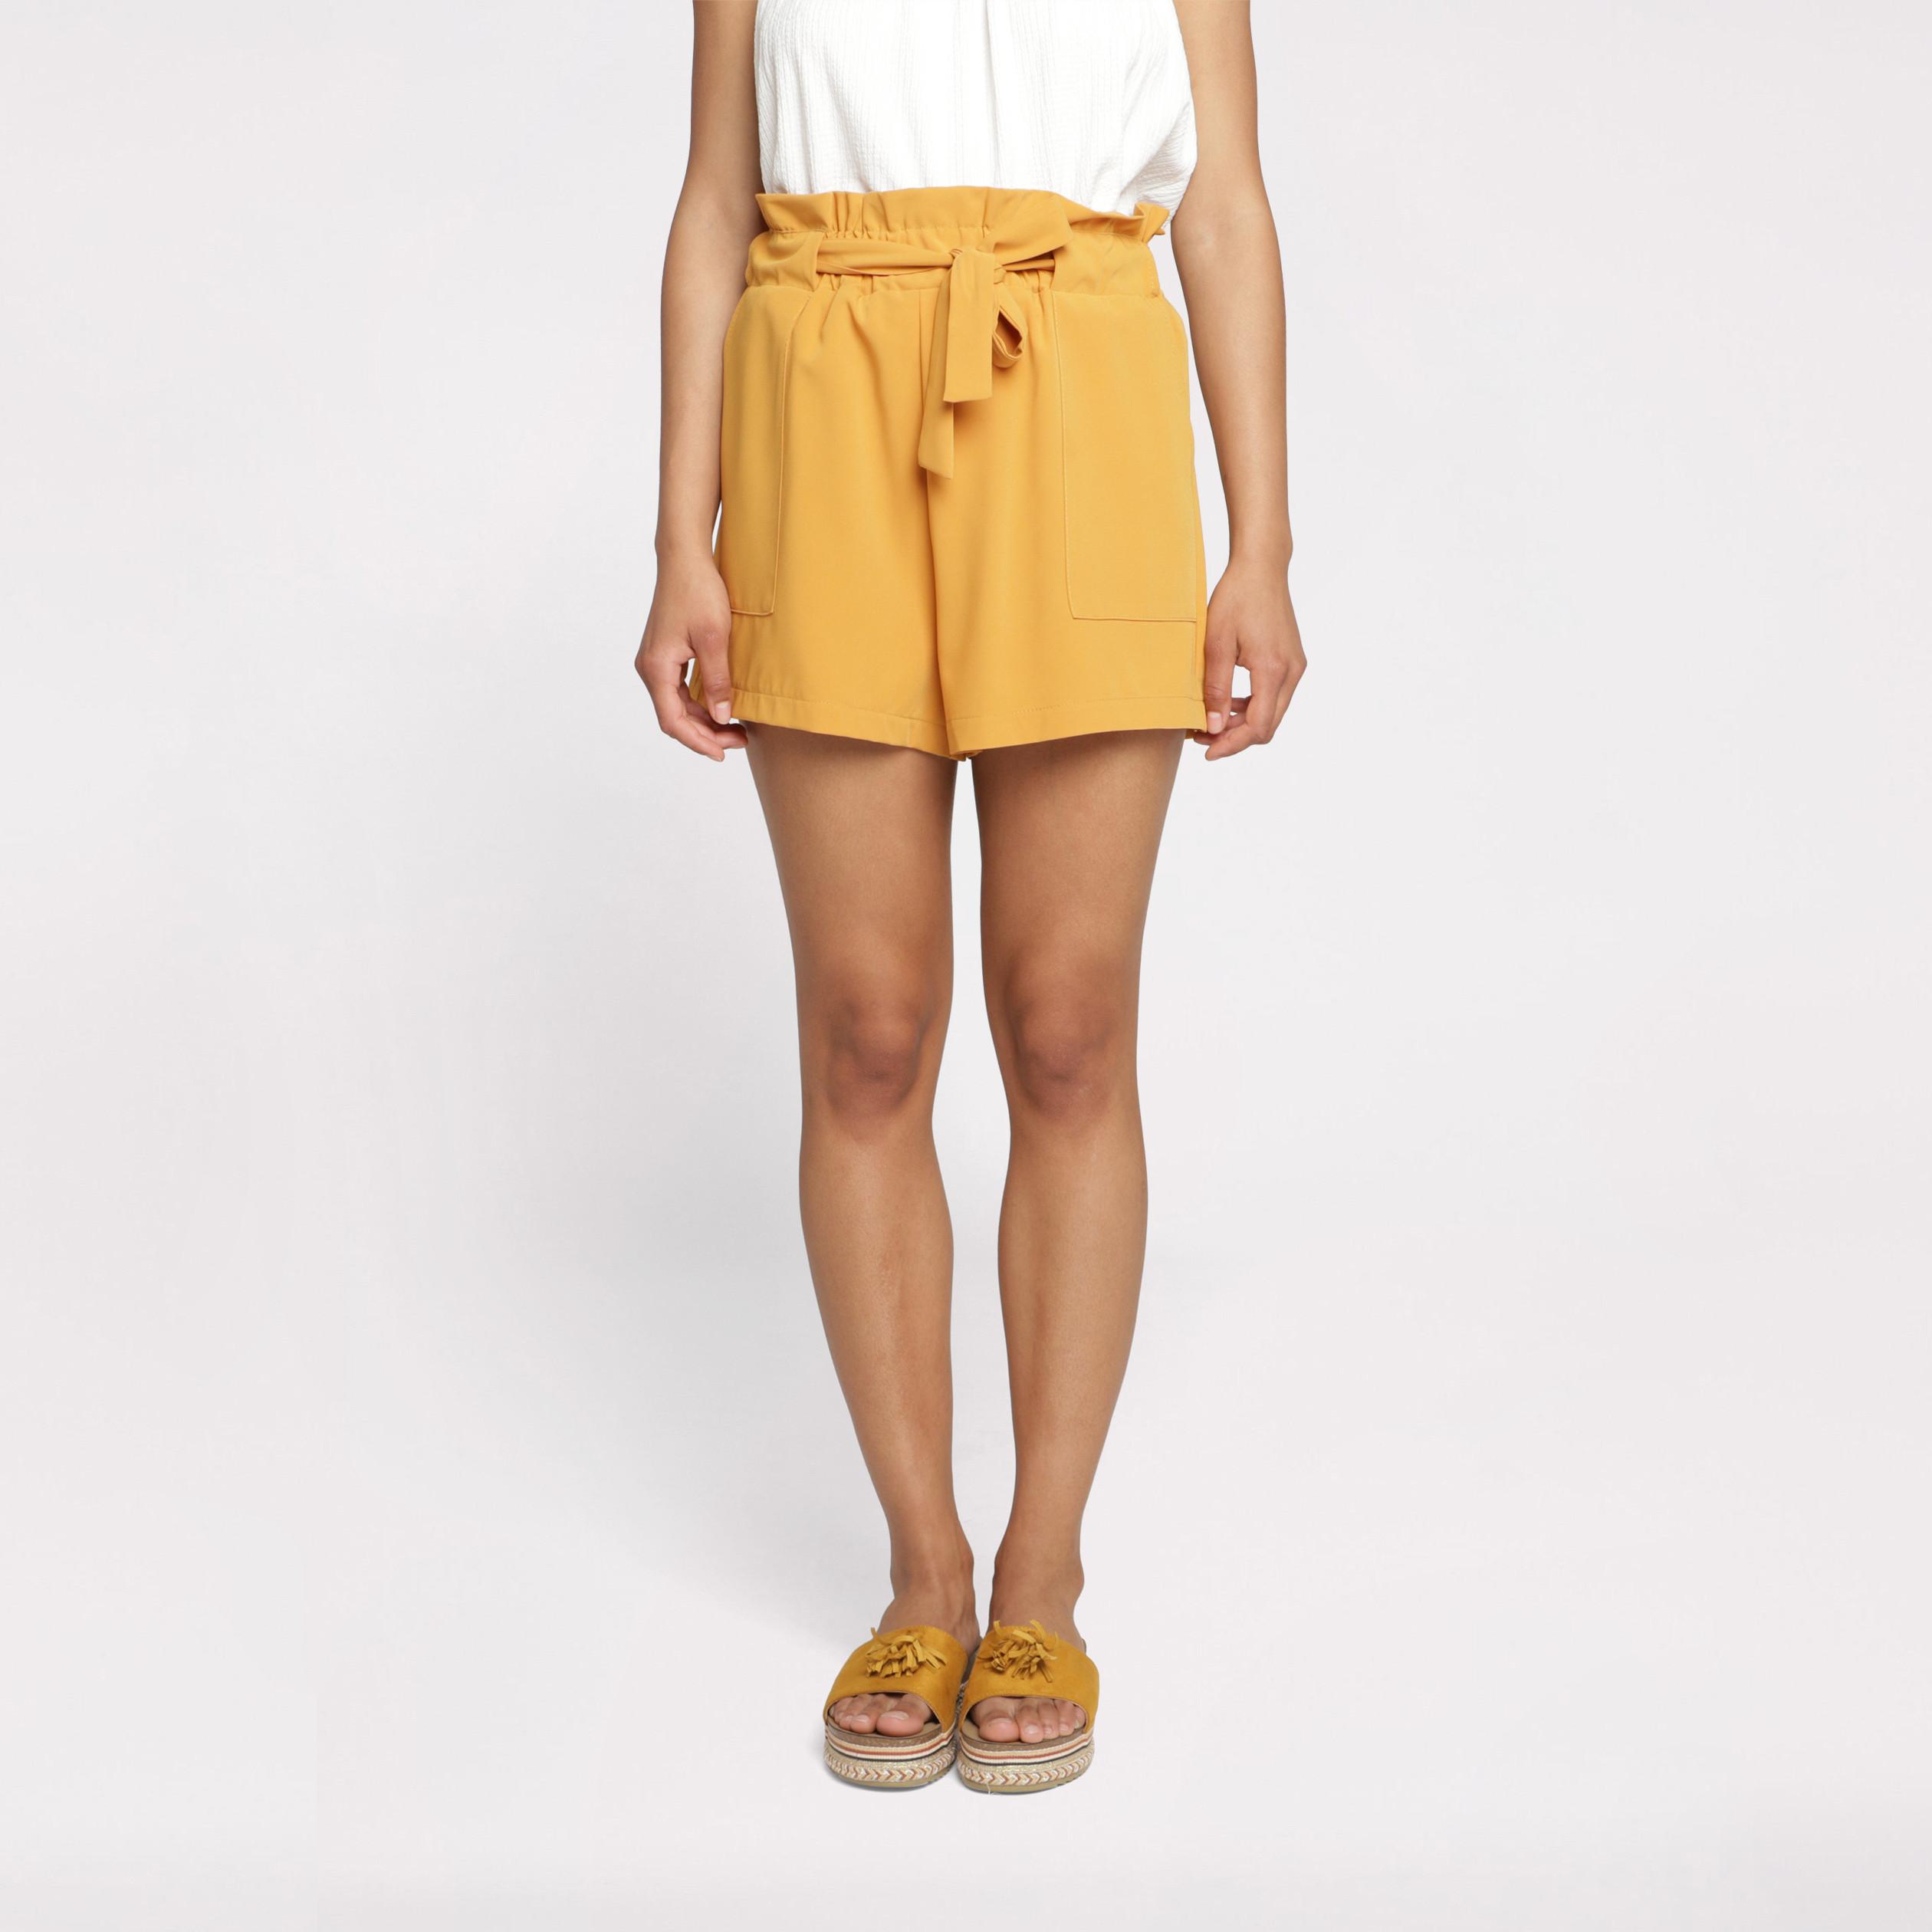 Short fluide taille standard jaune or femme